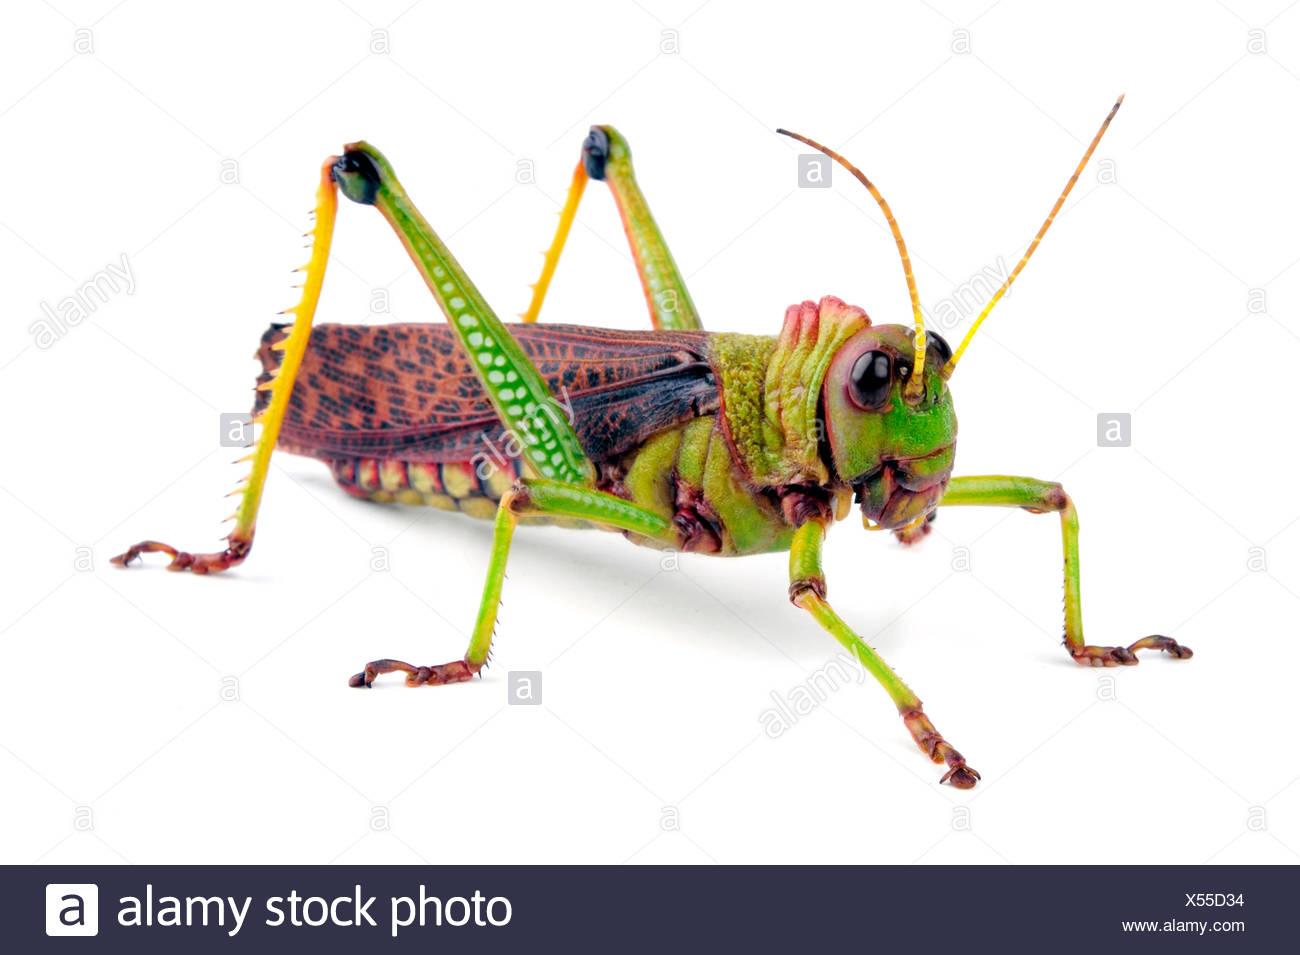 Suedamerikanische Riesenheuschrecke, Riesenheuschrecke (Tropidacris collaris), Freisteller | giant grasshopper (Tropidacris coll - Stock Image